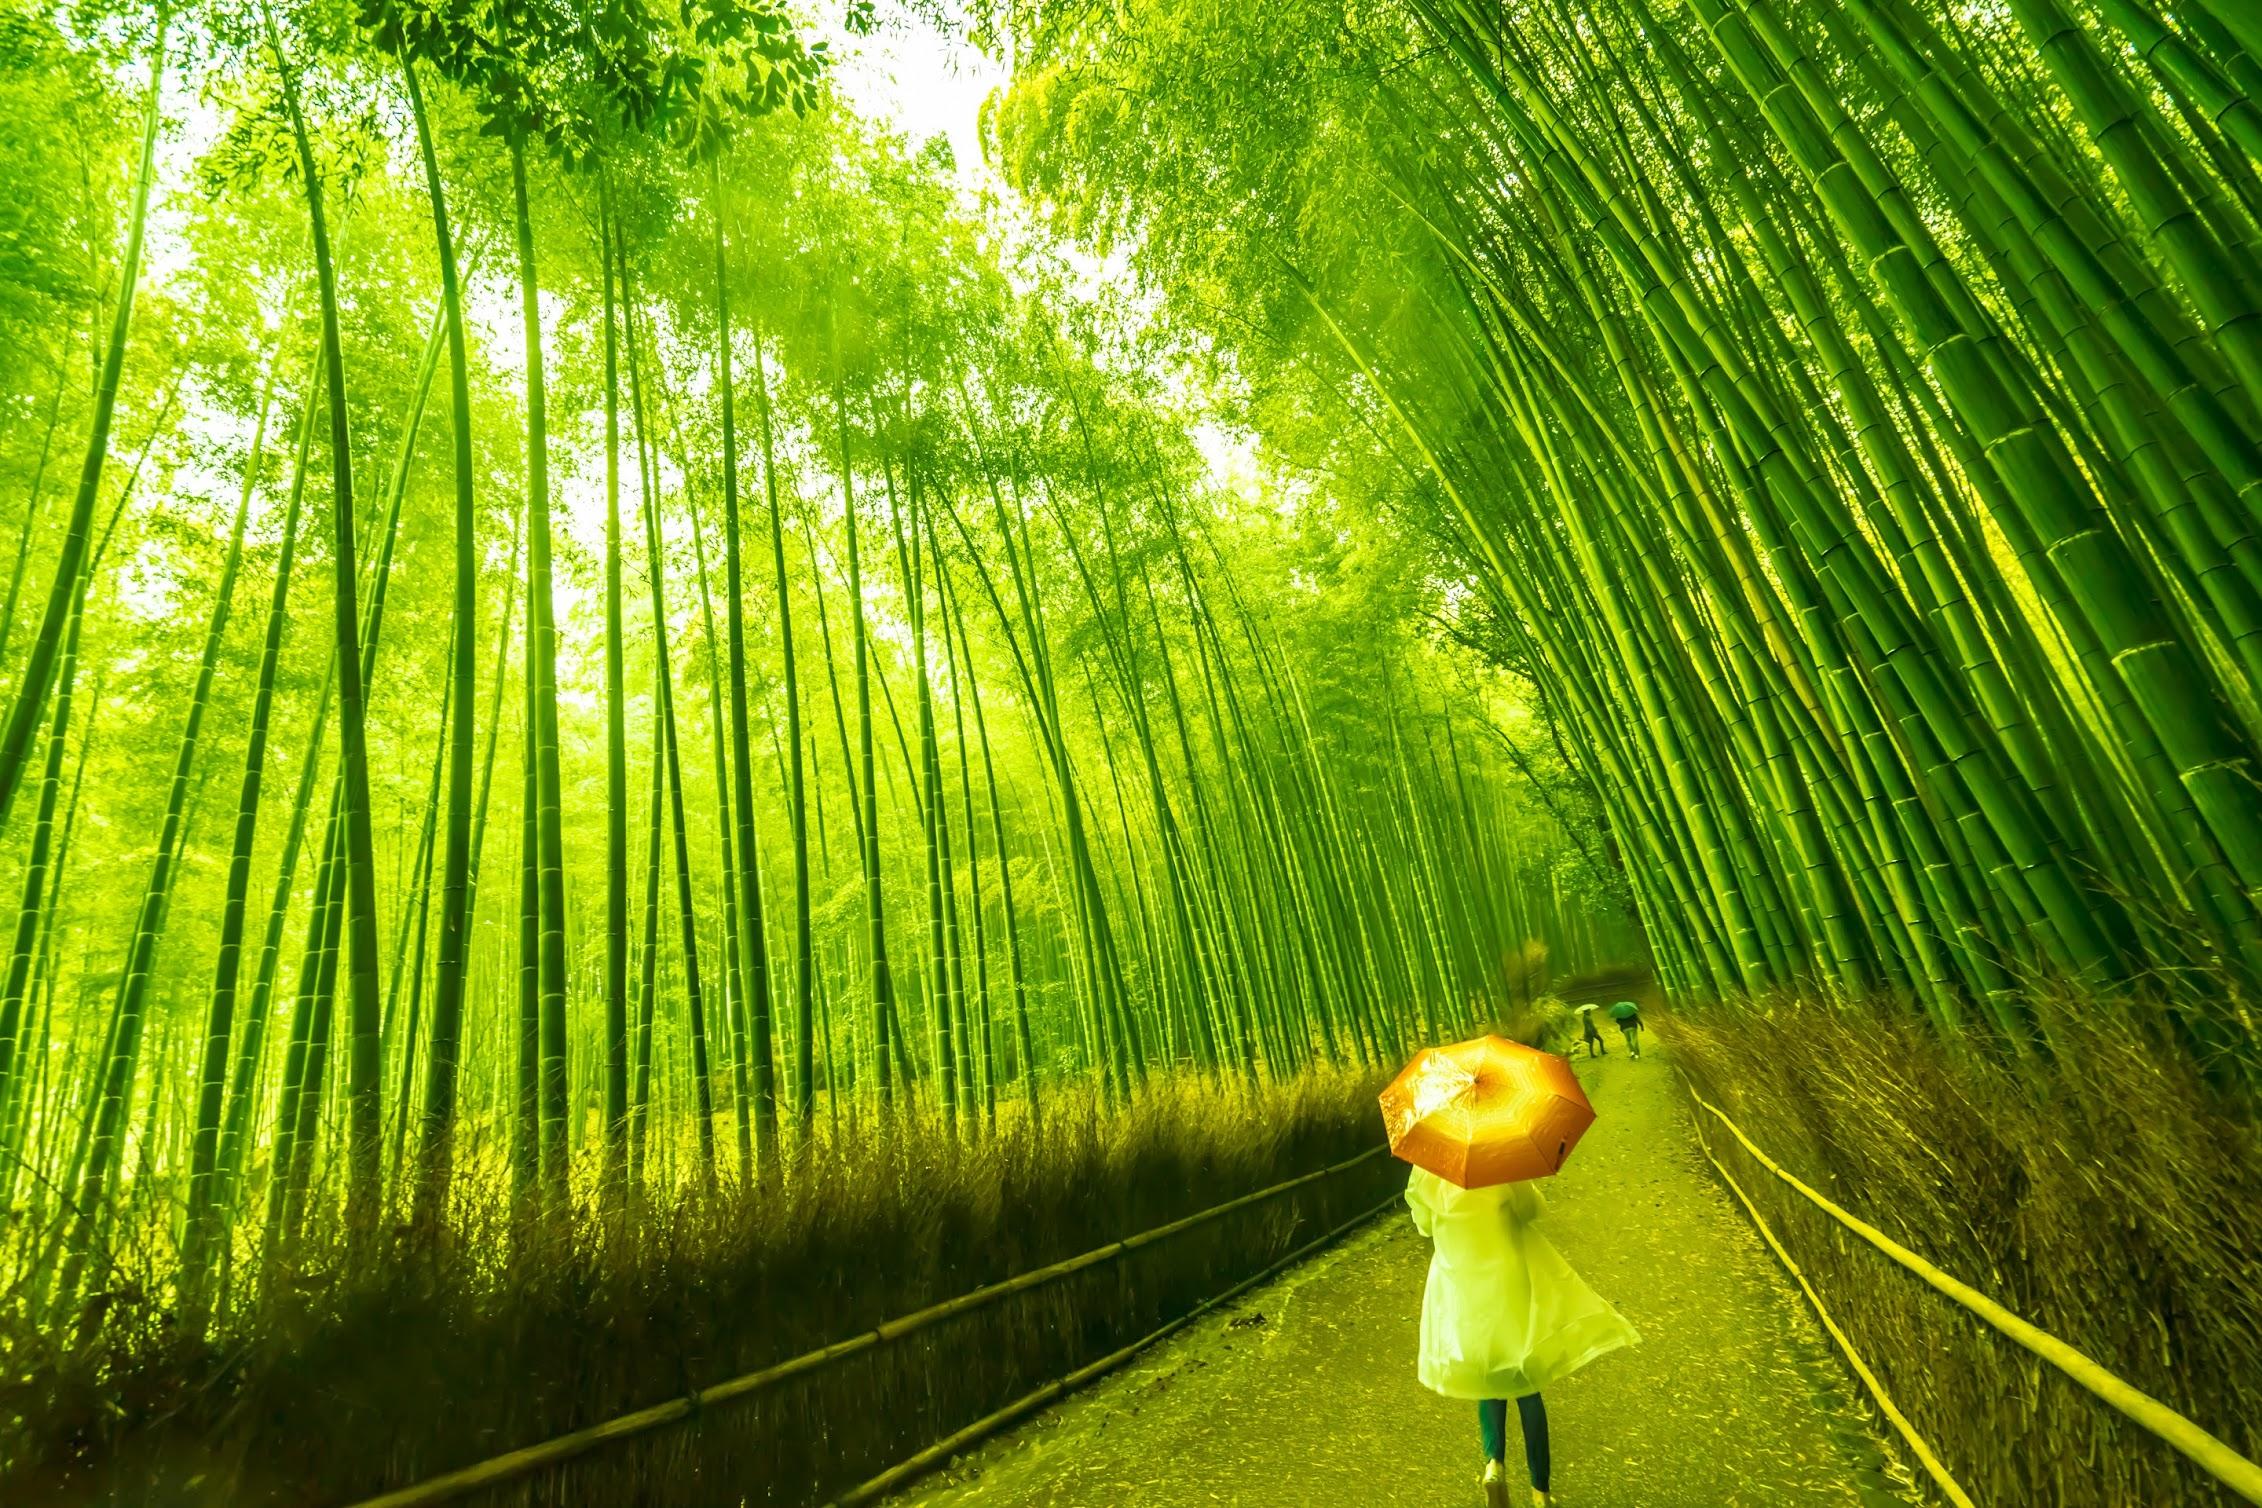 Kyoto Bamboo grove1